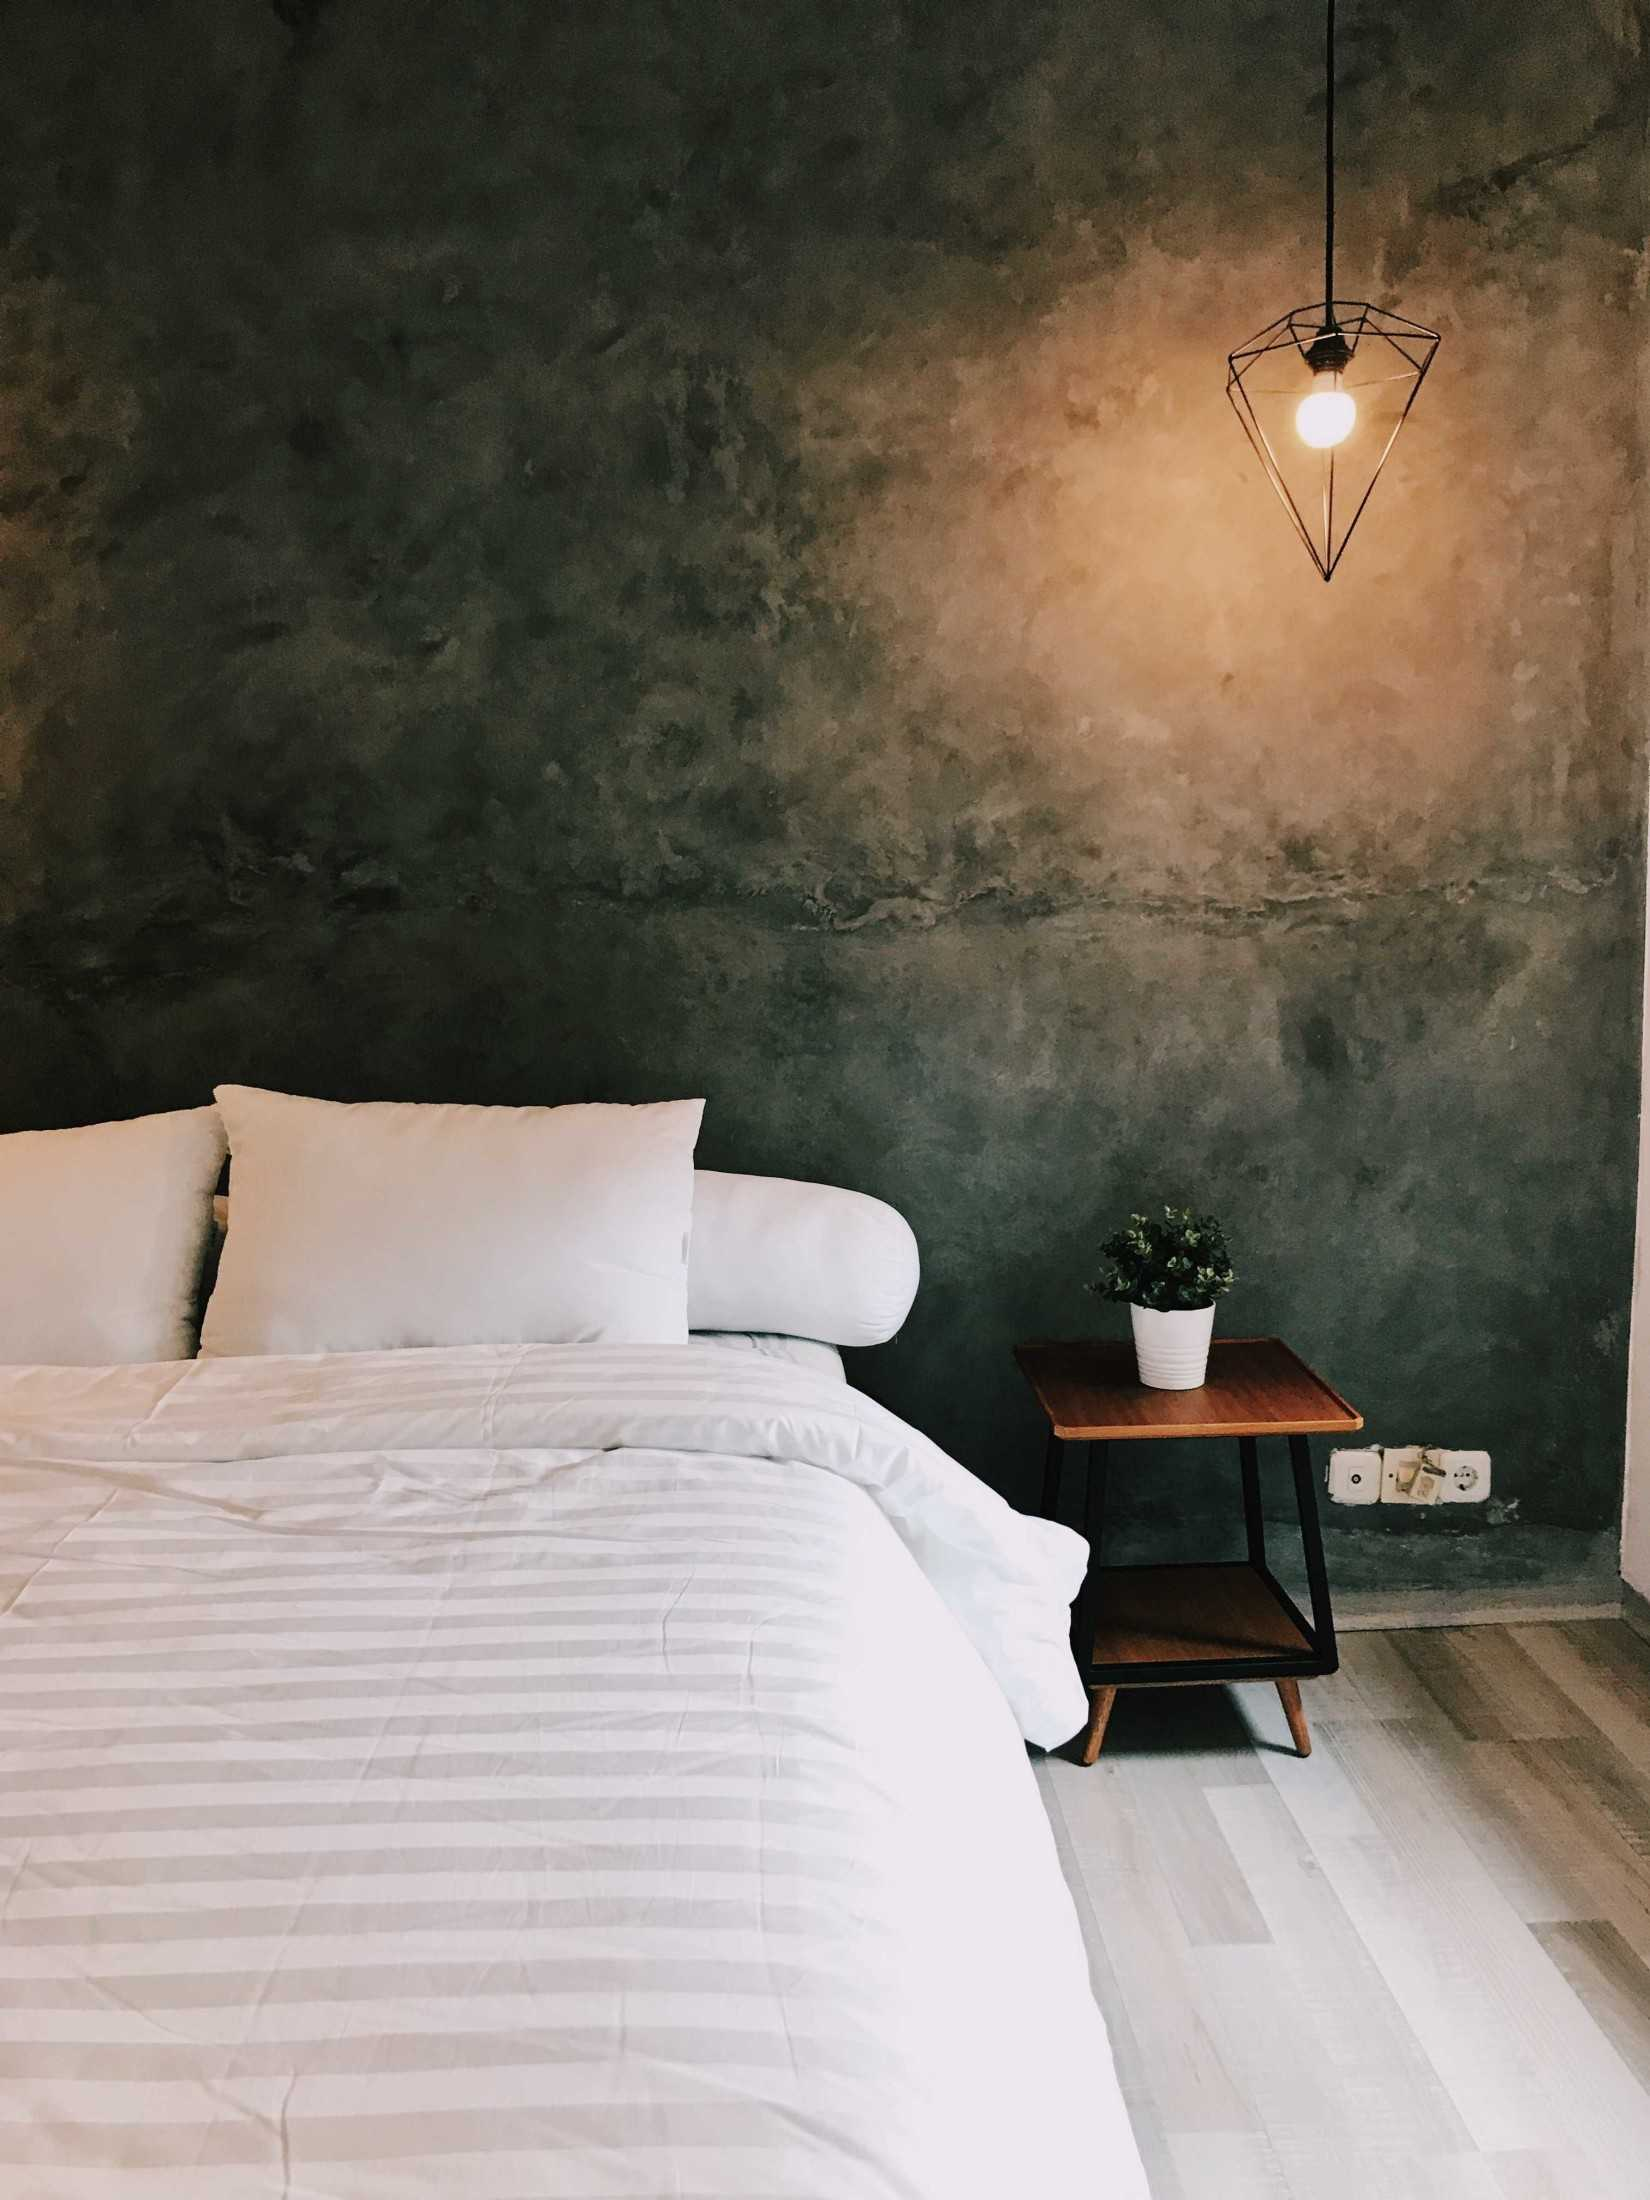 Home By Fabelio.com Komering Airbnb Gambir, Kota Jakarta Pusat, Daerah Khusus Ibukota Jakarta, Indonesia Gambir, Kota Jakarta Pusat, Daerah Khusus Ibukota Jakarta, Indonesia Home-By-Fabeliocom-Komering-Airbnb  64879